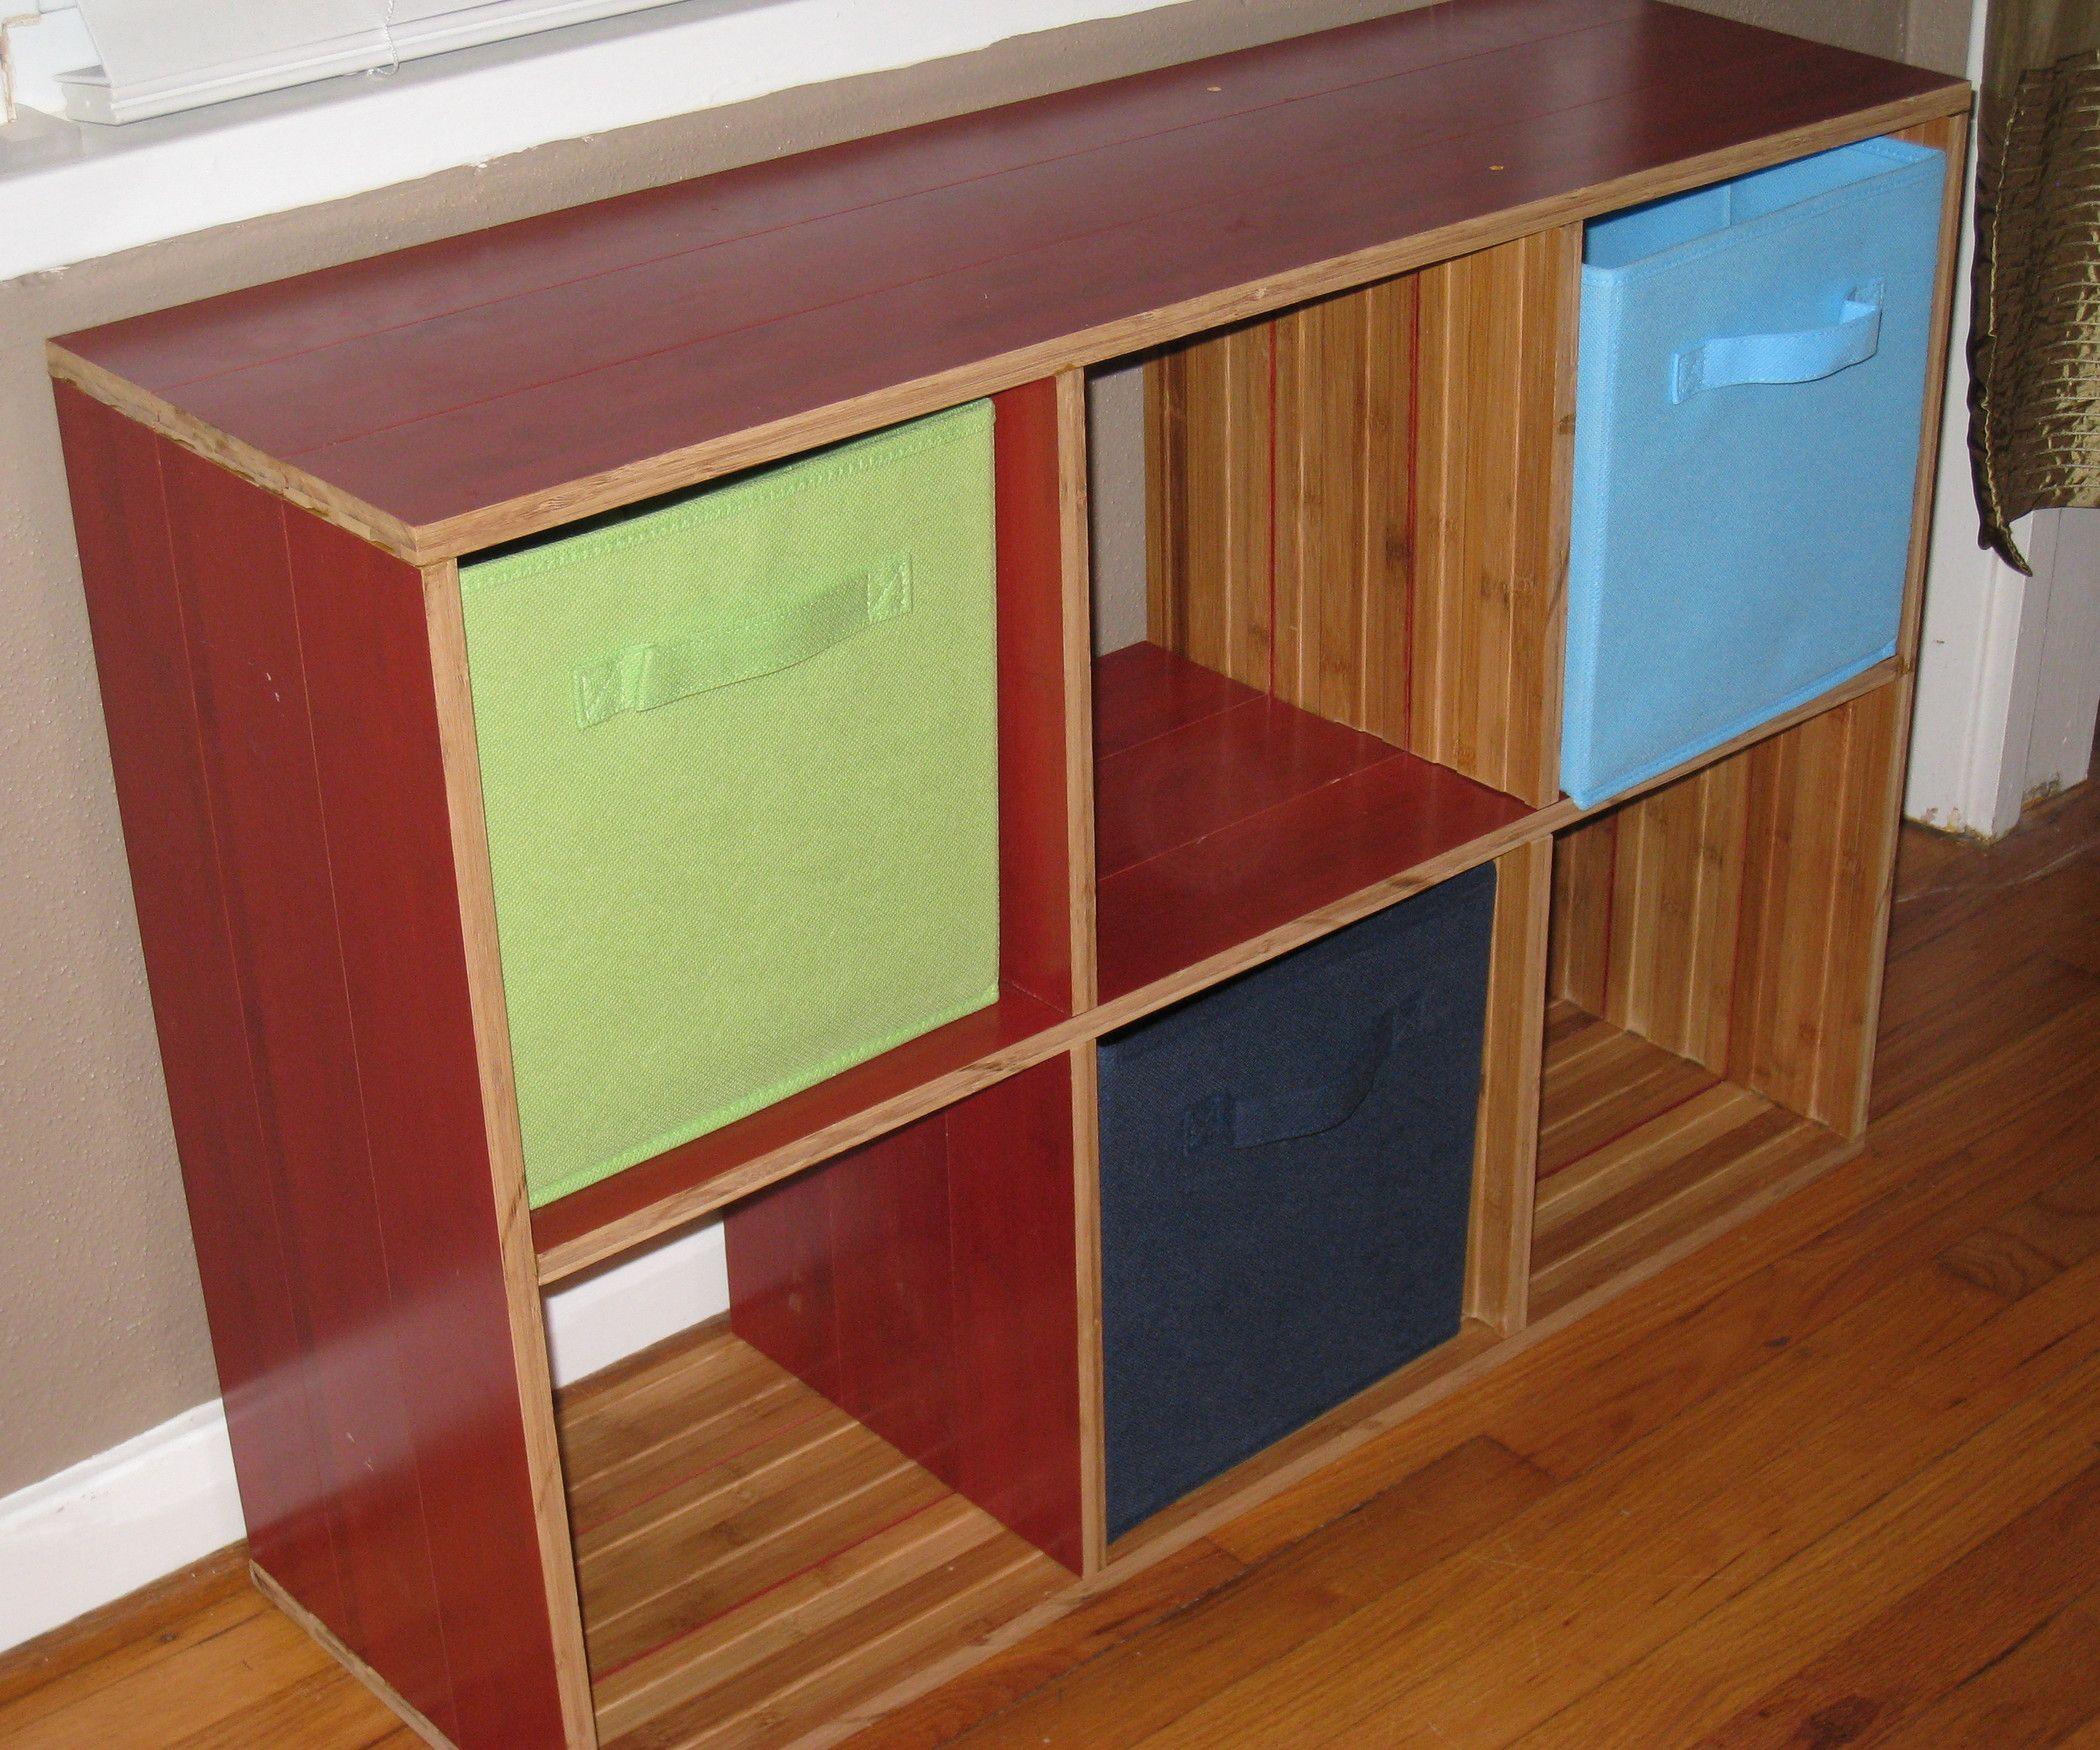 Laminate Flooring Diy, Using Laminate Flooring For Shelves